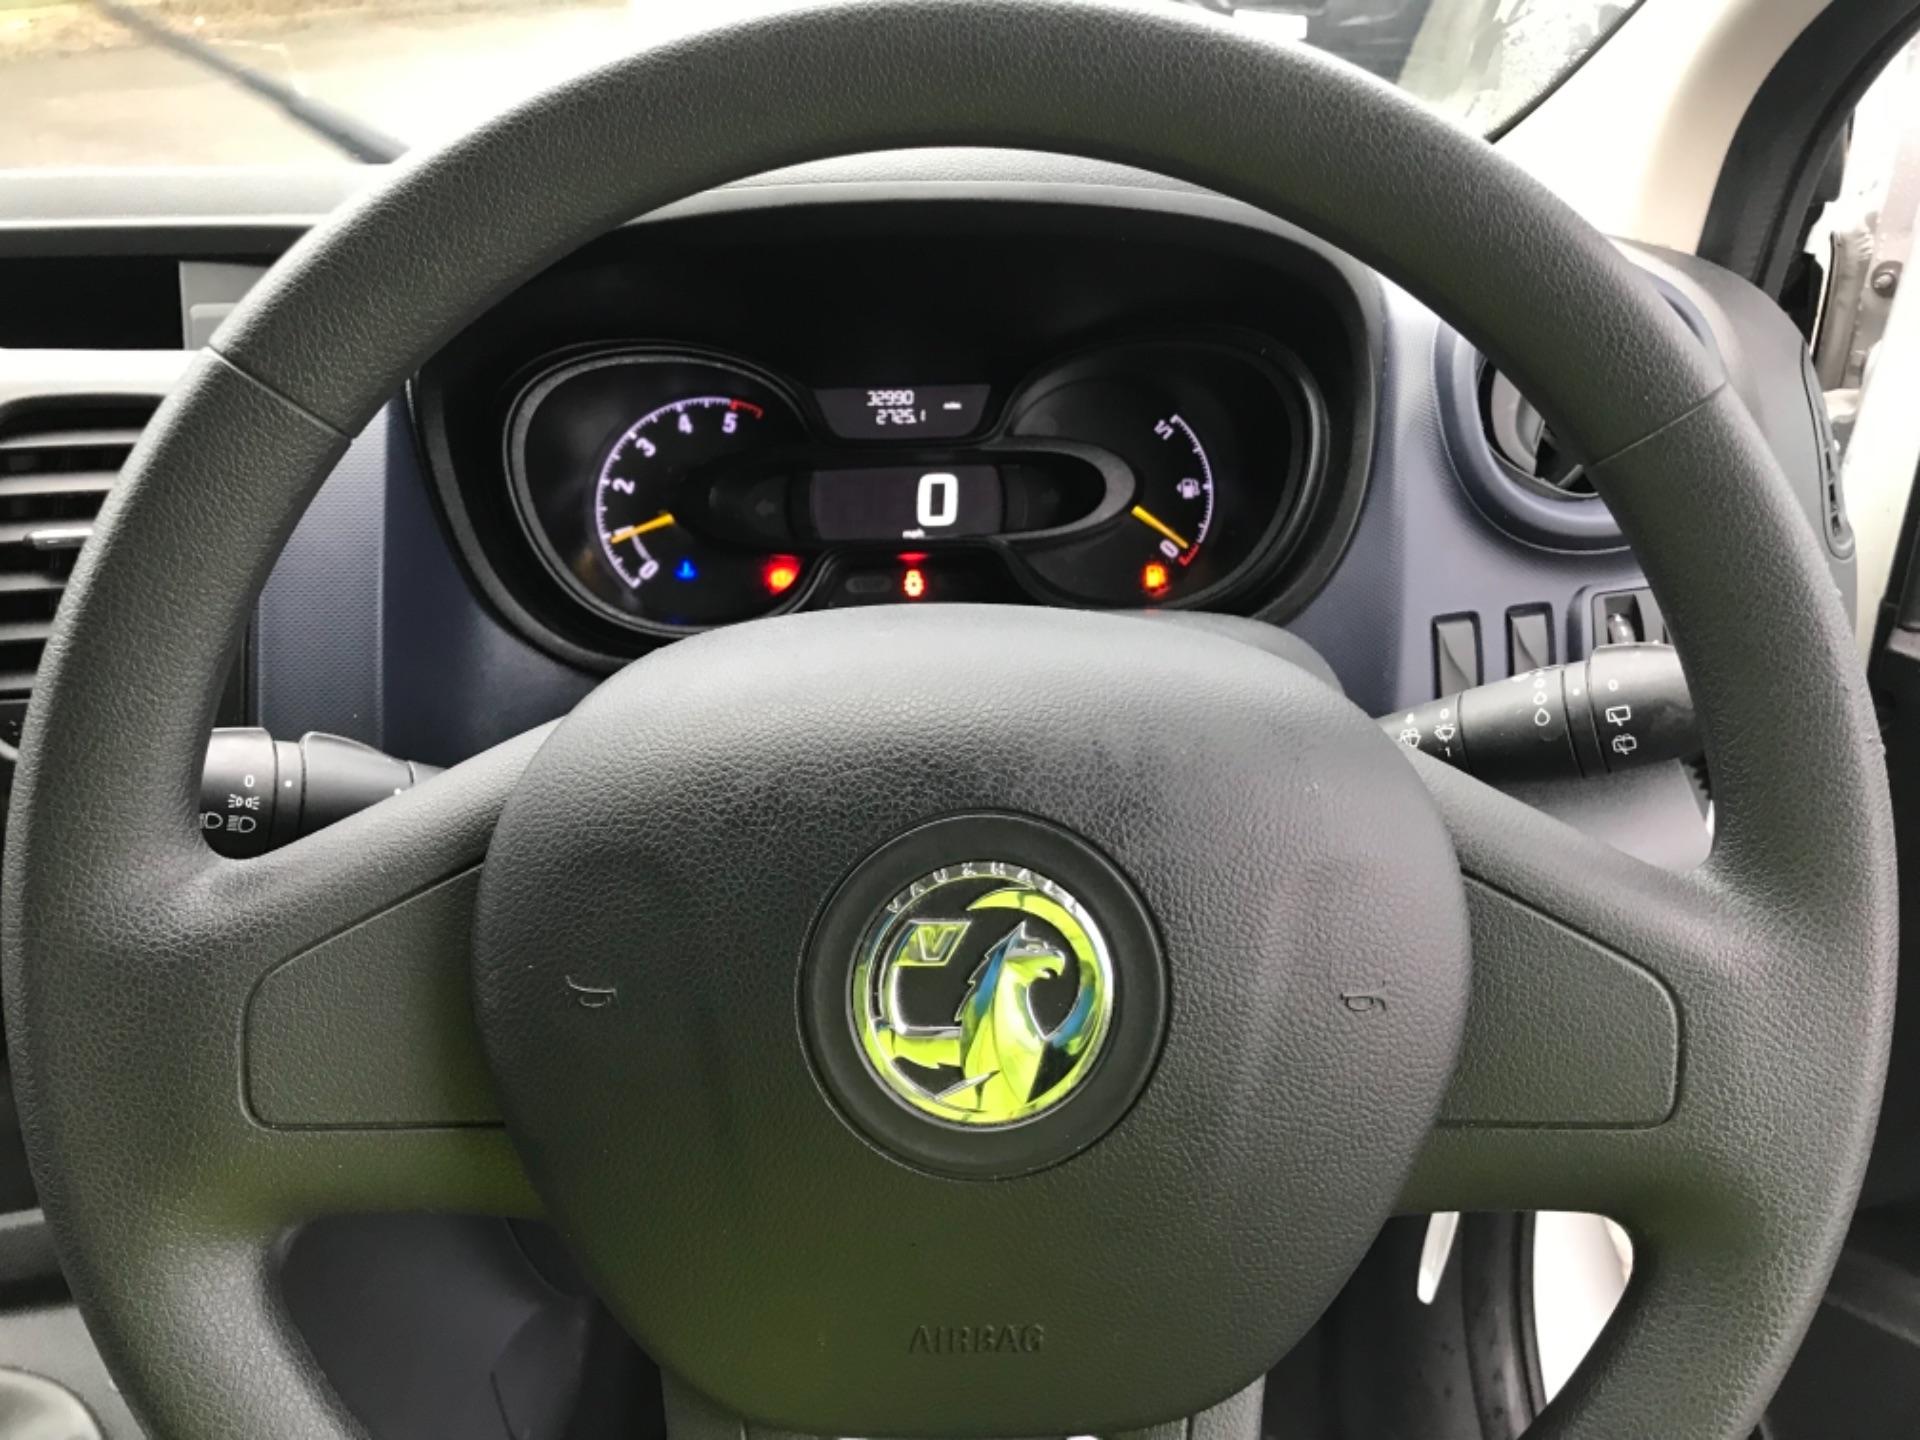 2017 Vauxhall Vivaro 2900 1.6Cdti Biturbo 125Ps H1 Combi 9 Seat Euro 6 (DY17UGF) Image 17